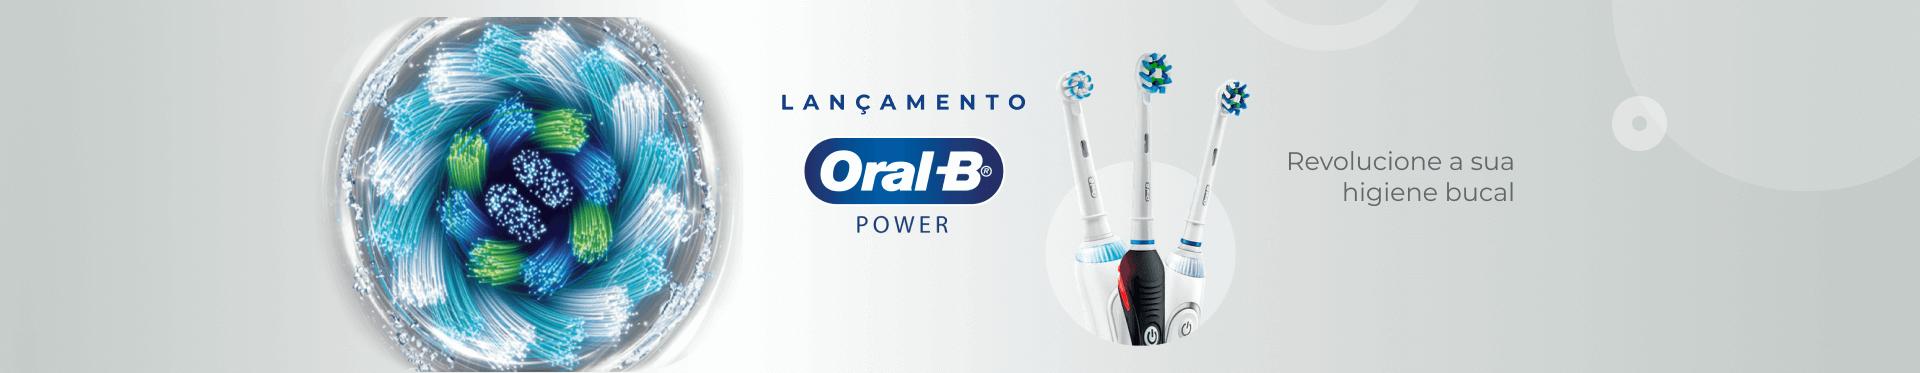 Oral B Power